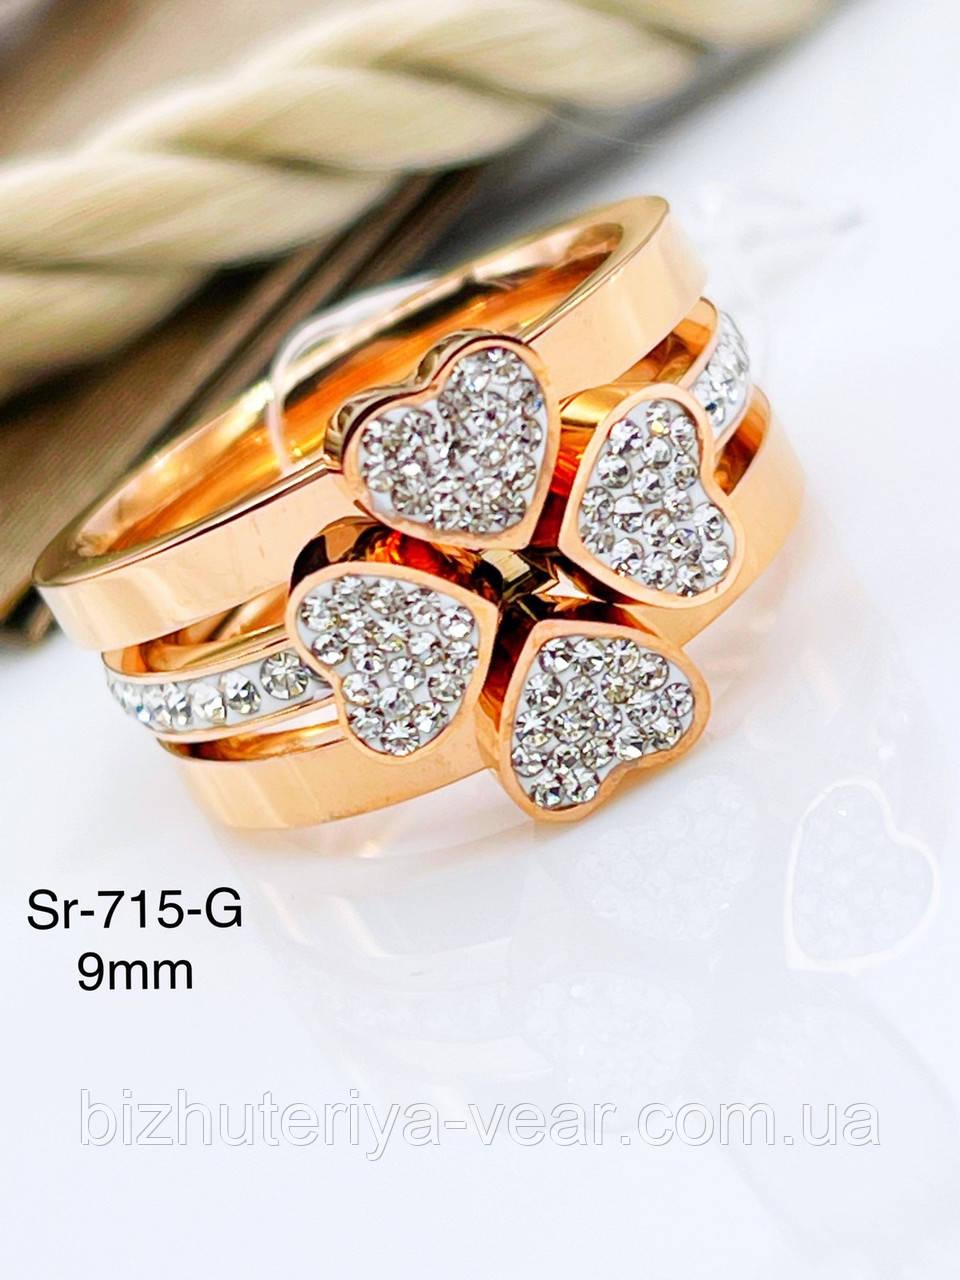 КОЛЬЦО STAINLEES STEEL(ПРЕМИУМ) Sr-715(6,7,8,9)